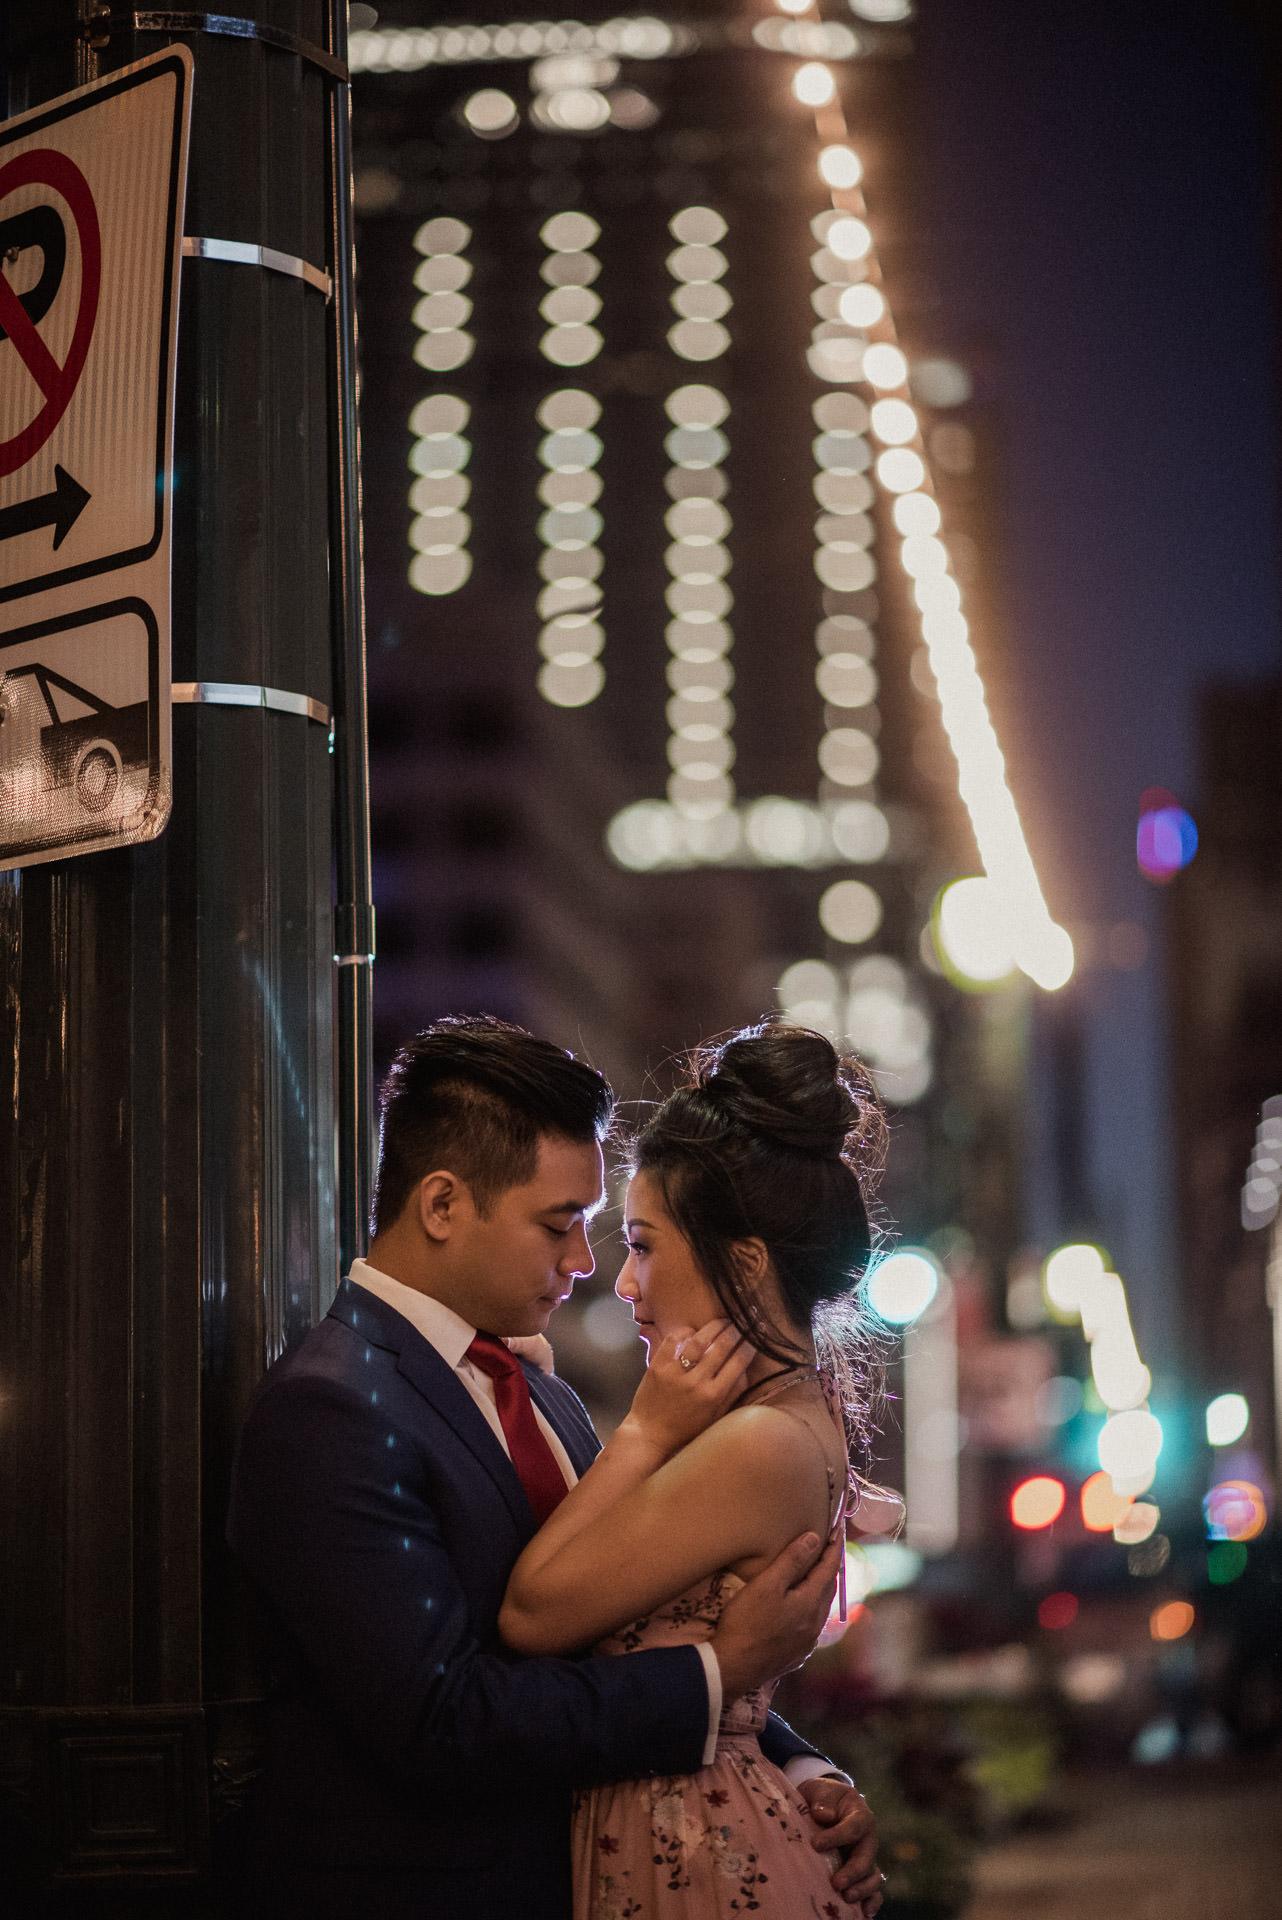 Houston Engagement Photo Location Ideas Intimate Wedding Elopement Engagement Photographer Houston Beyond